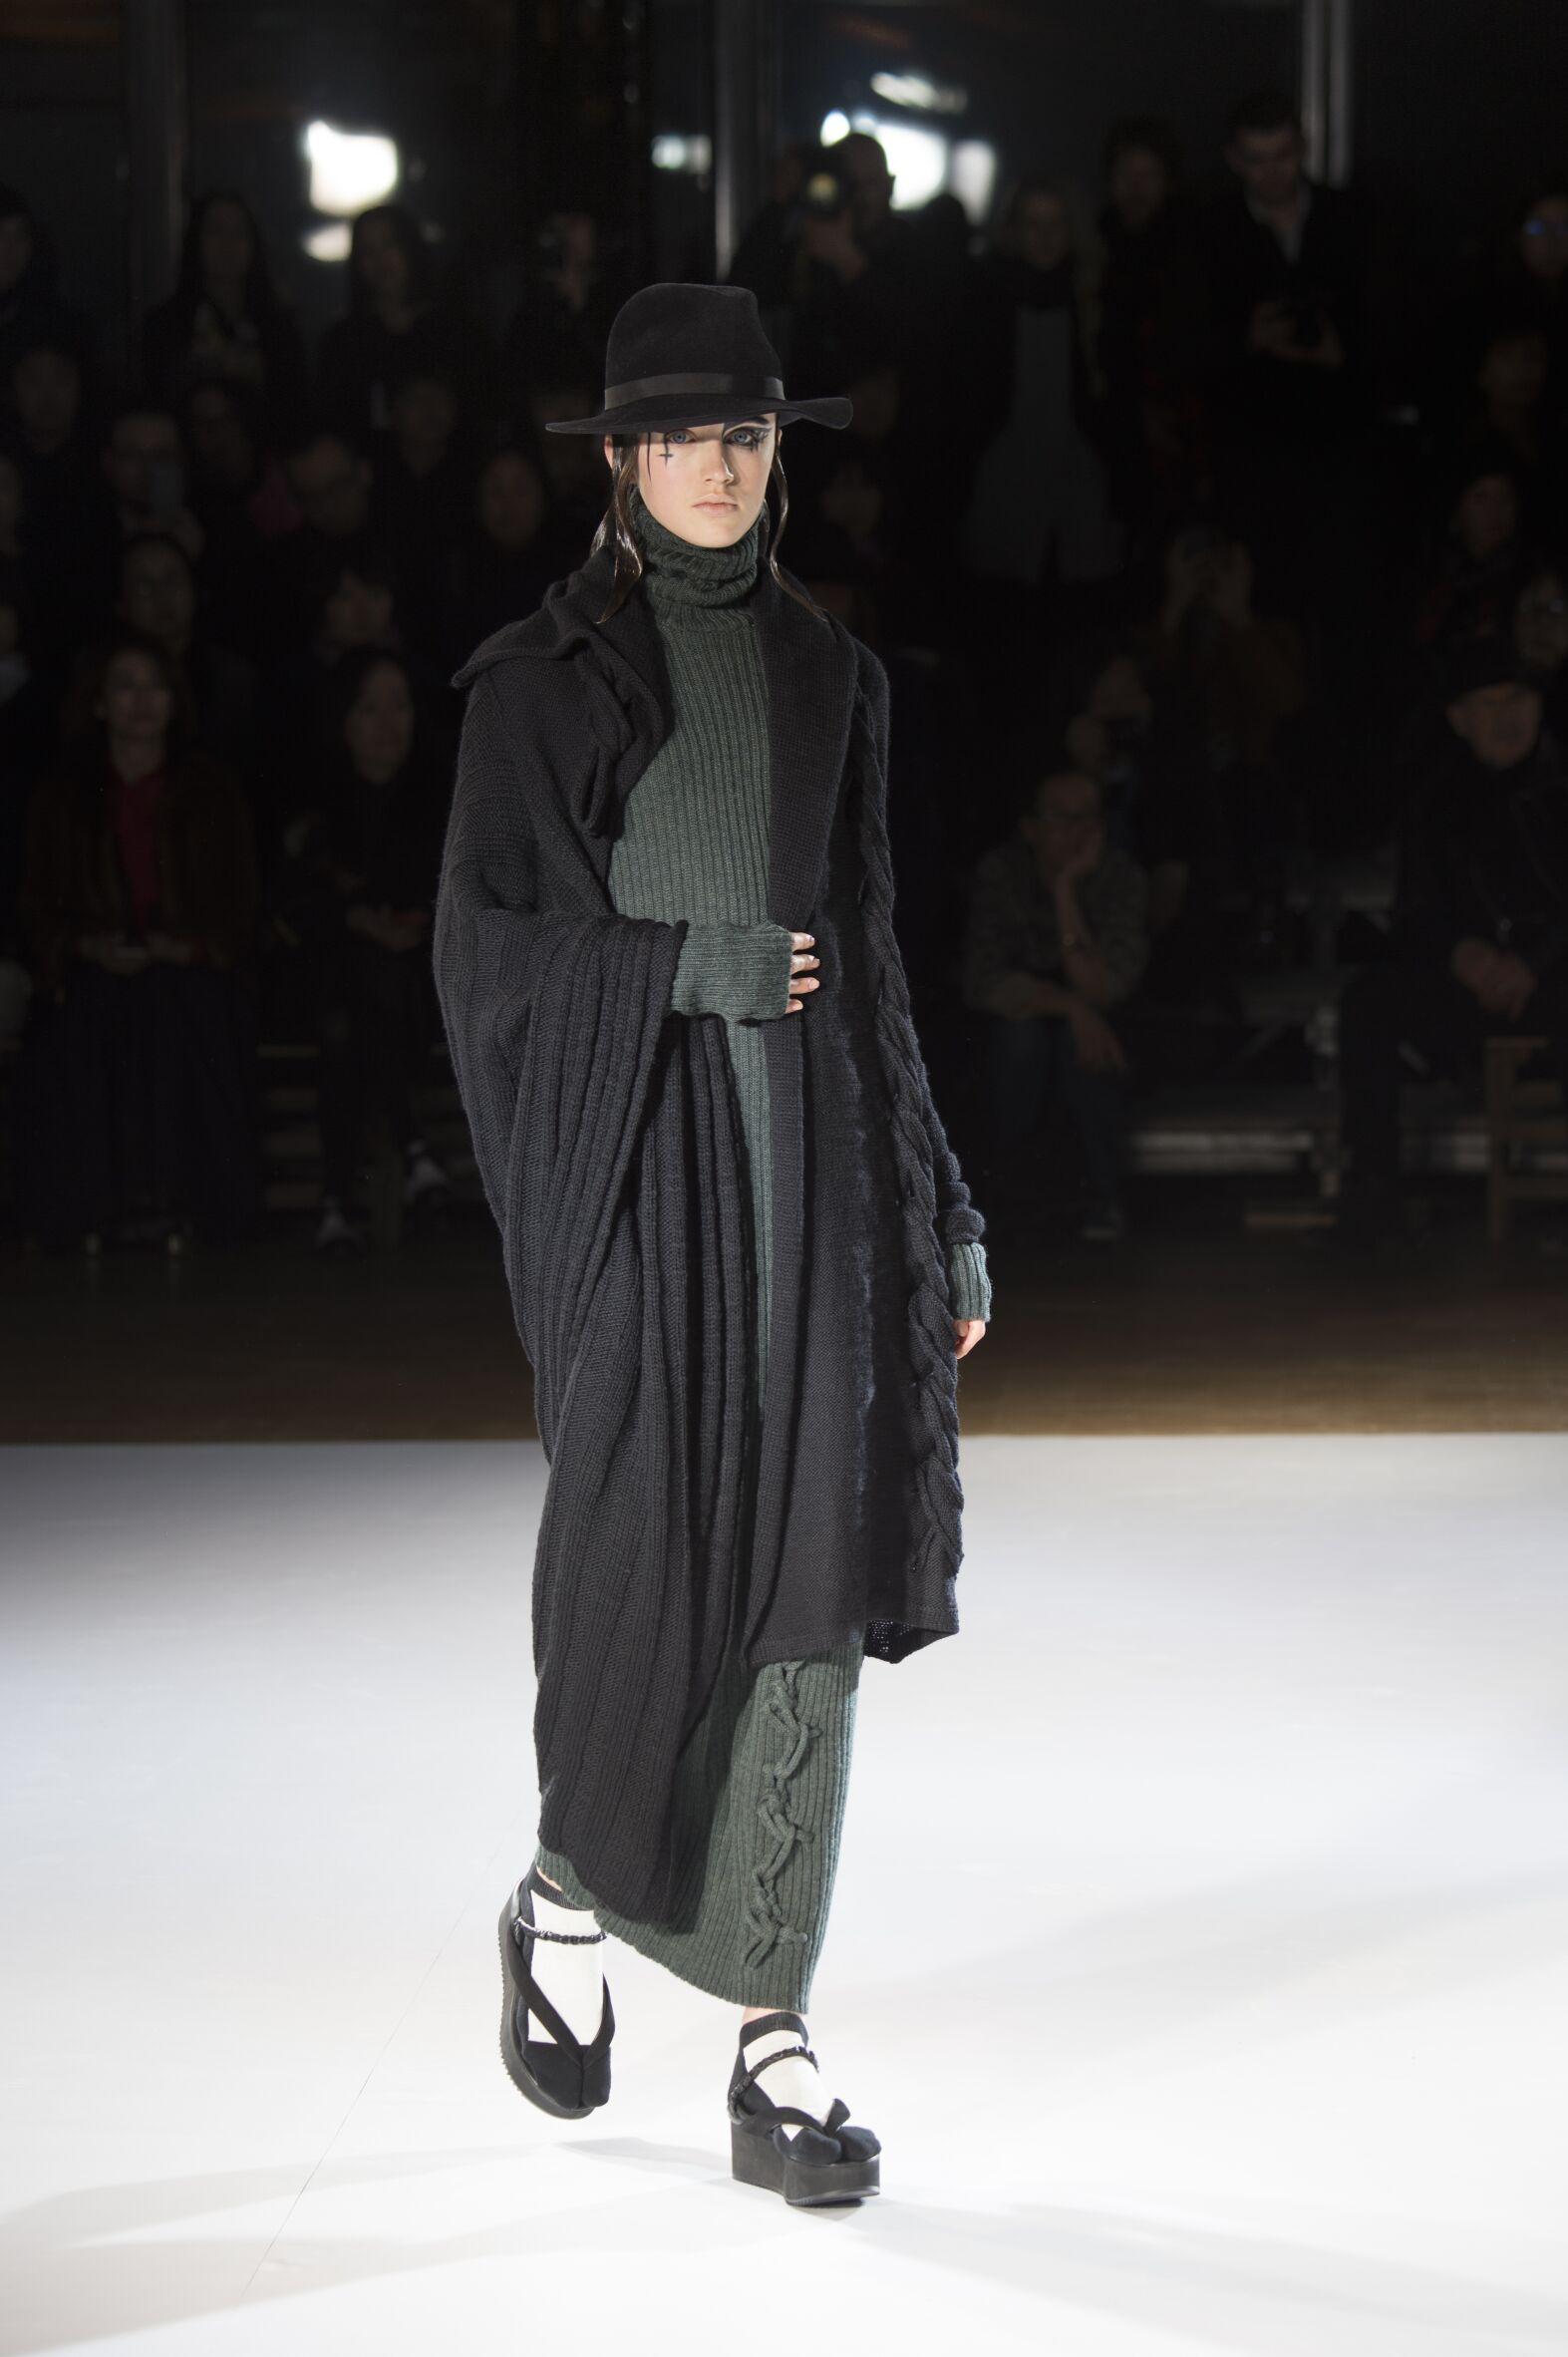 Catwalk Yohji Yamamoto Womenswear Collection Winter 2015